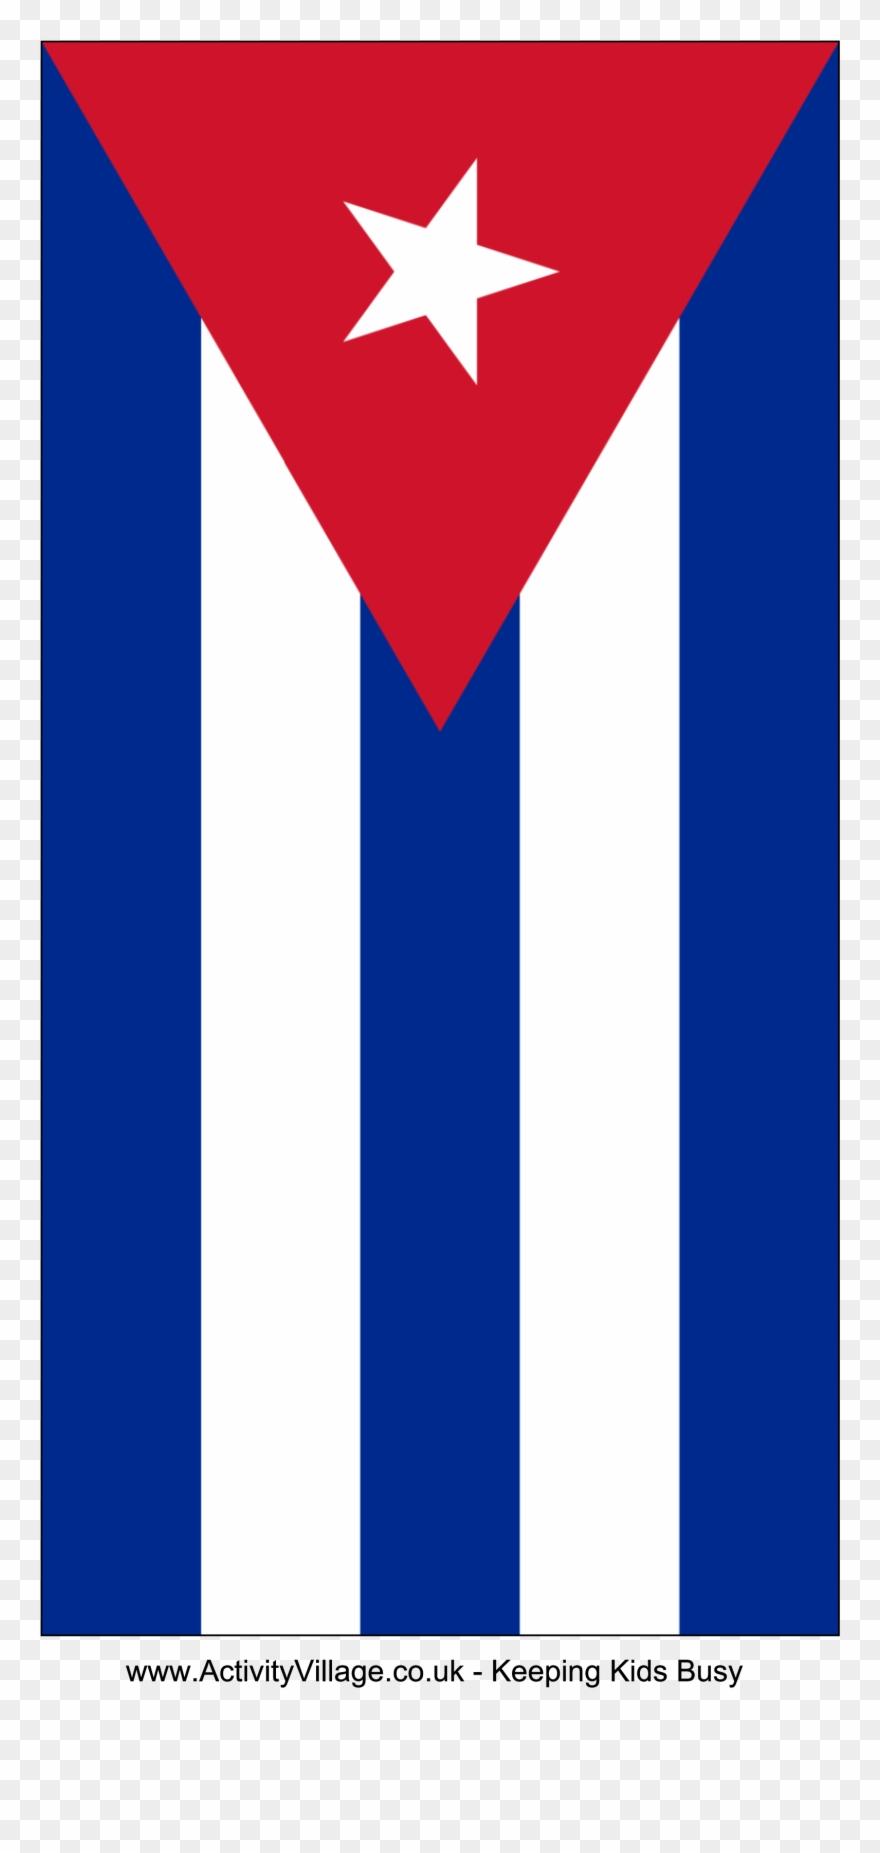 Clip Art Freeuse Cuba Free Printable Stickers Pinterest.